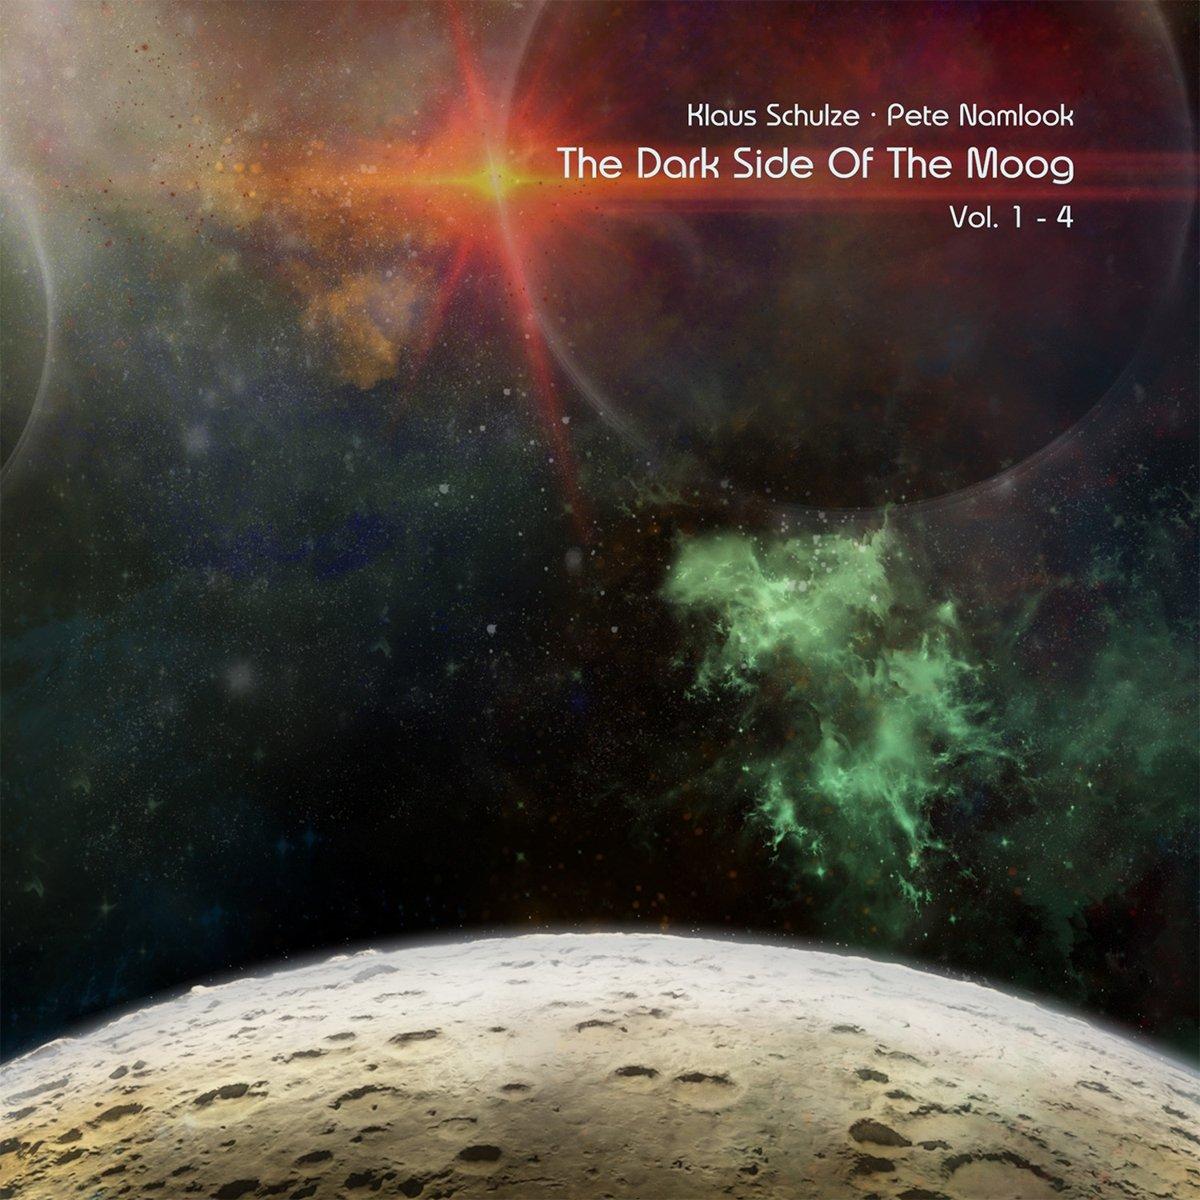 Dark Side of the Moog 1-4